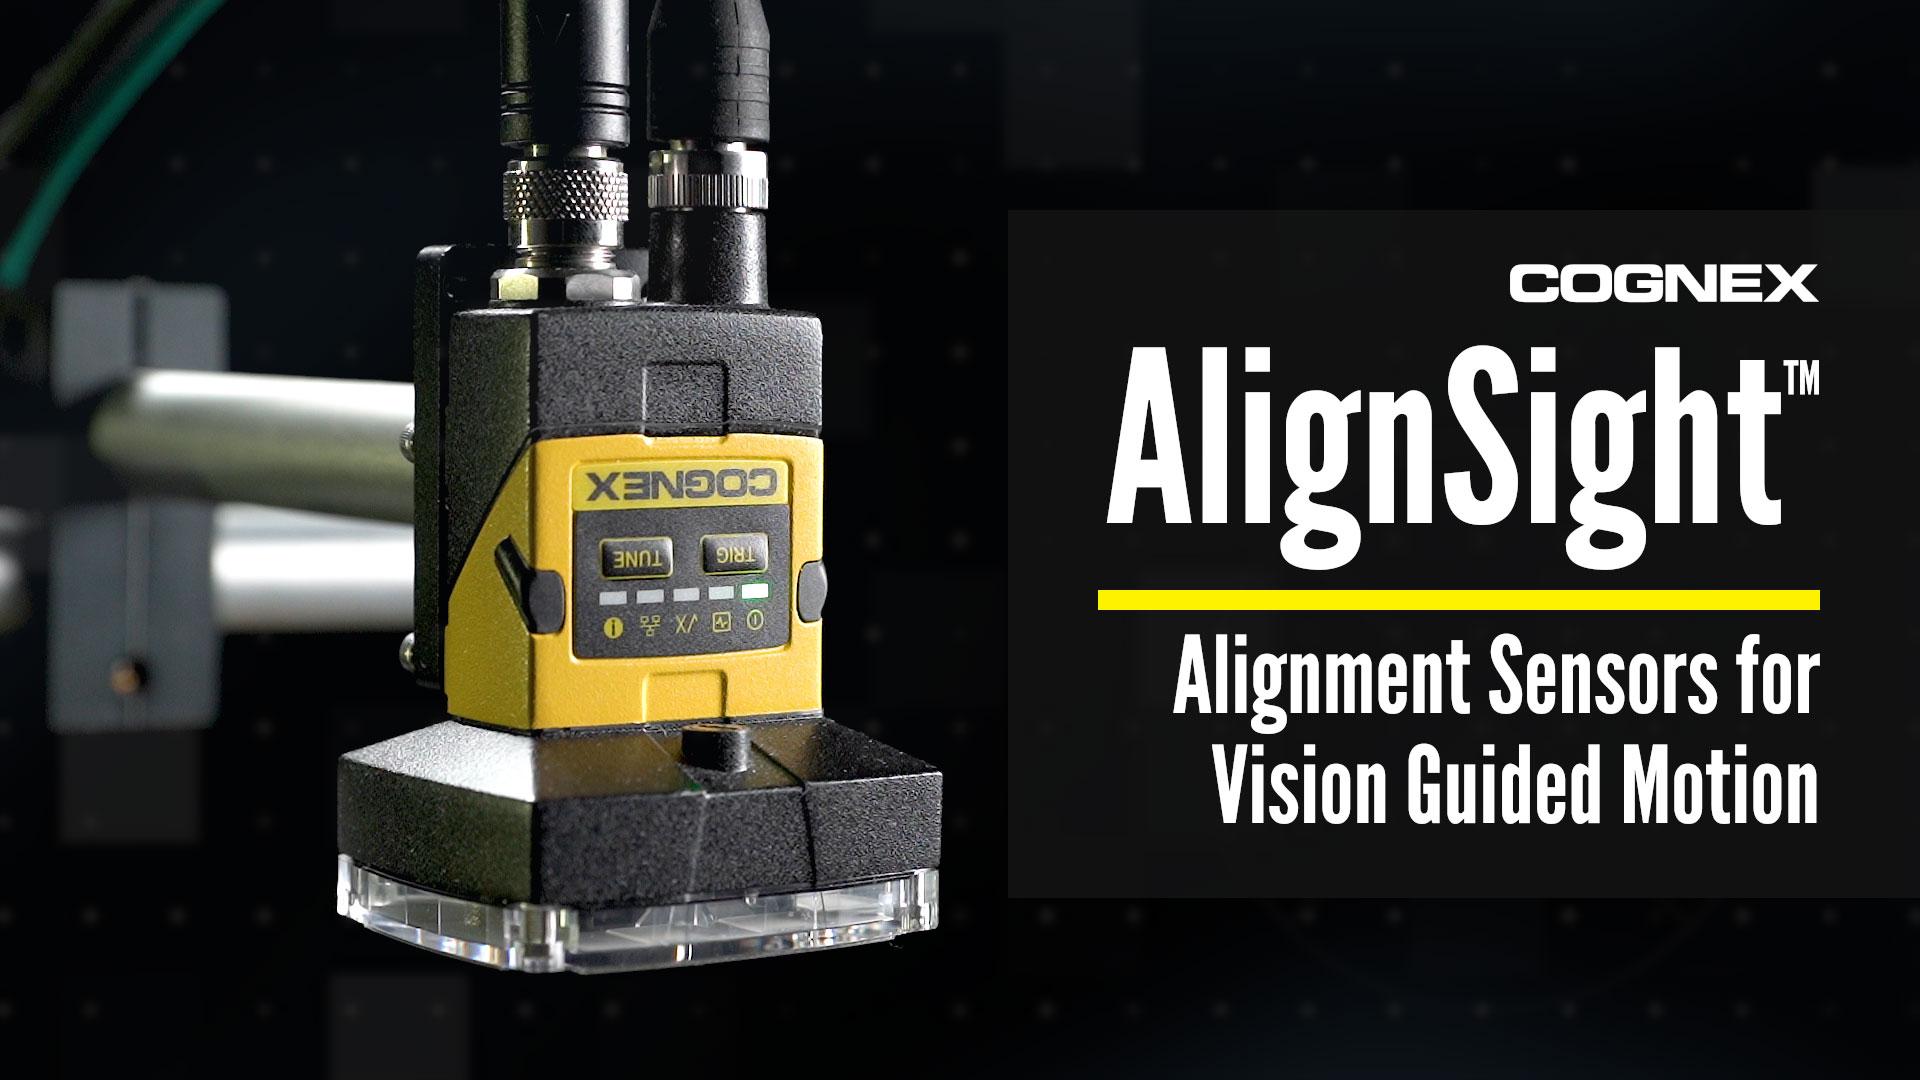 Cognex AlignSight Alignment Sensor Video Preview